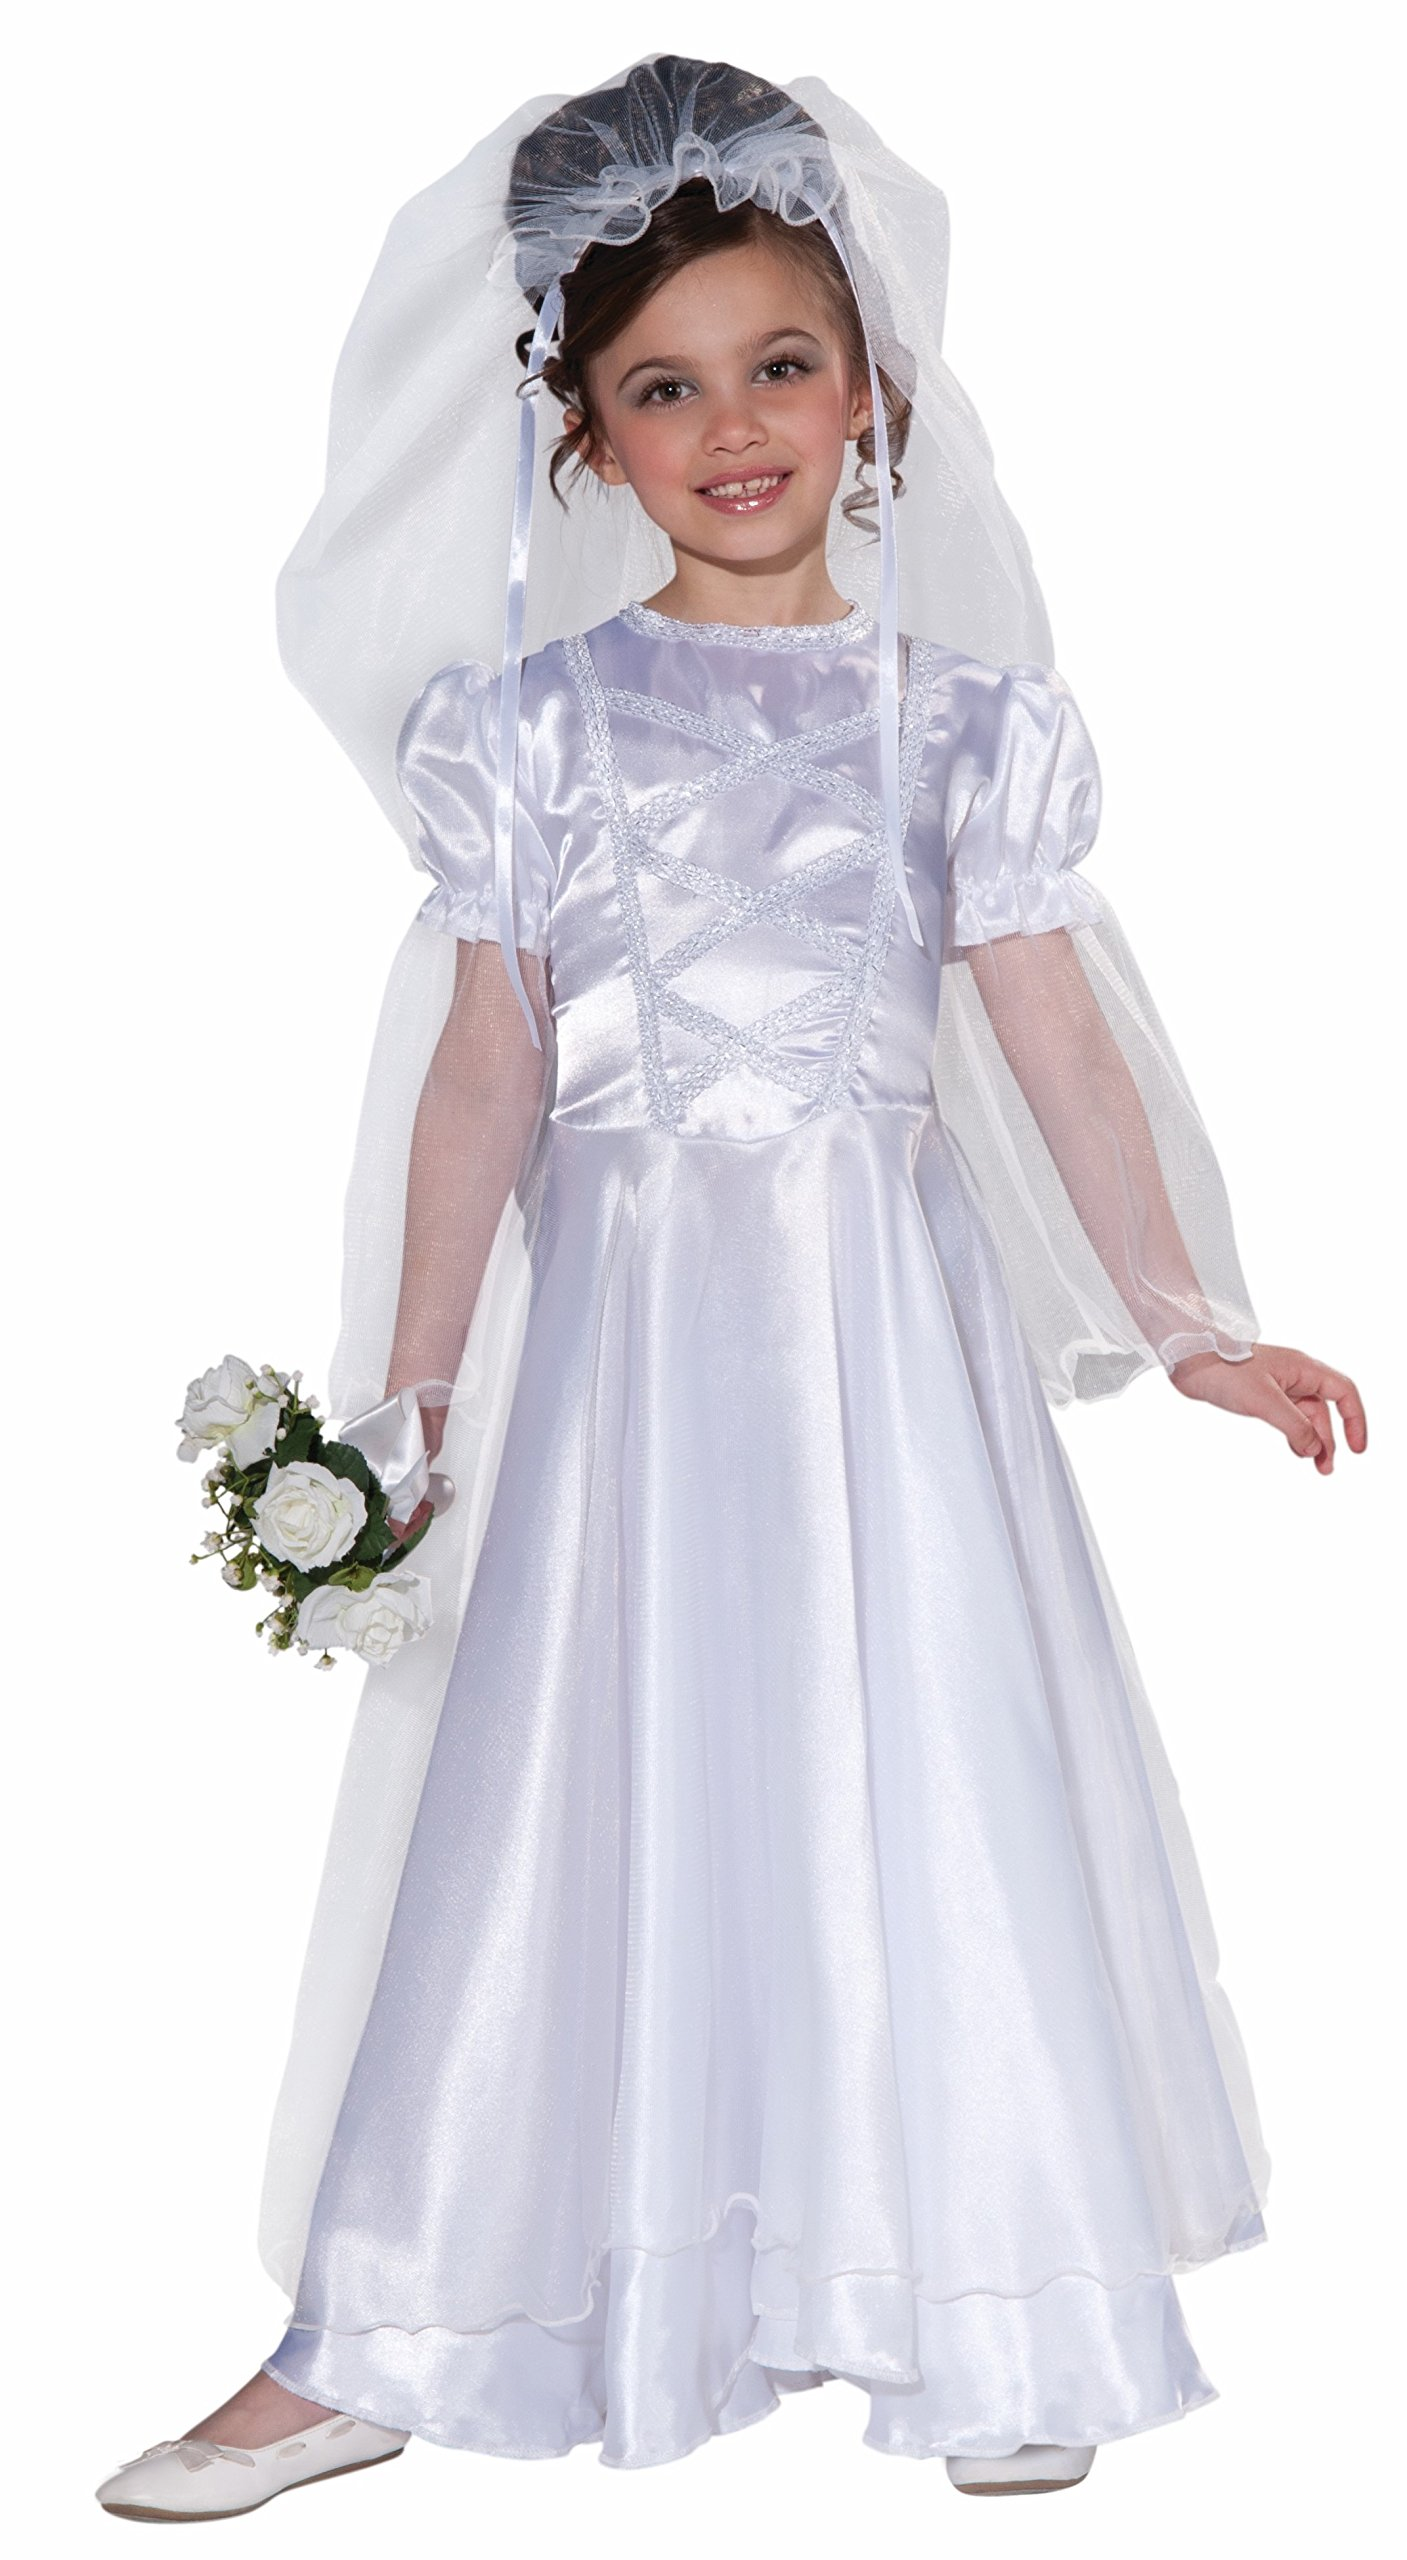 Forum Novelties Little Bride Wedding Belle Child Costume Dress and Veil, Small